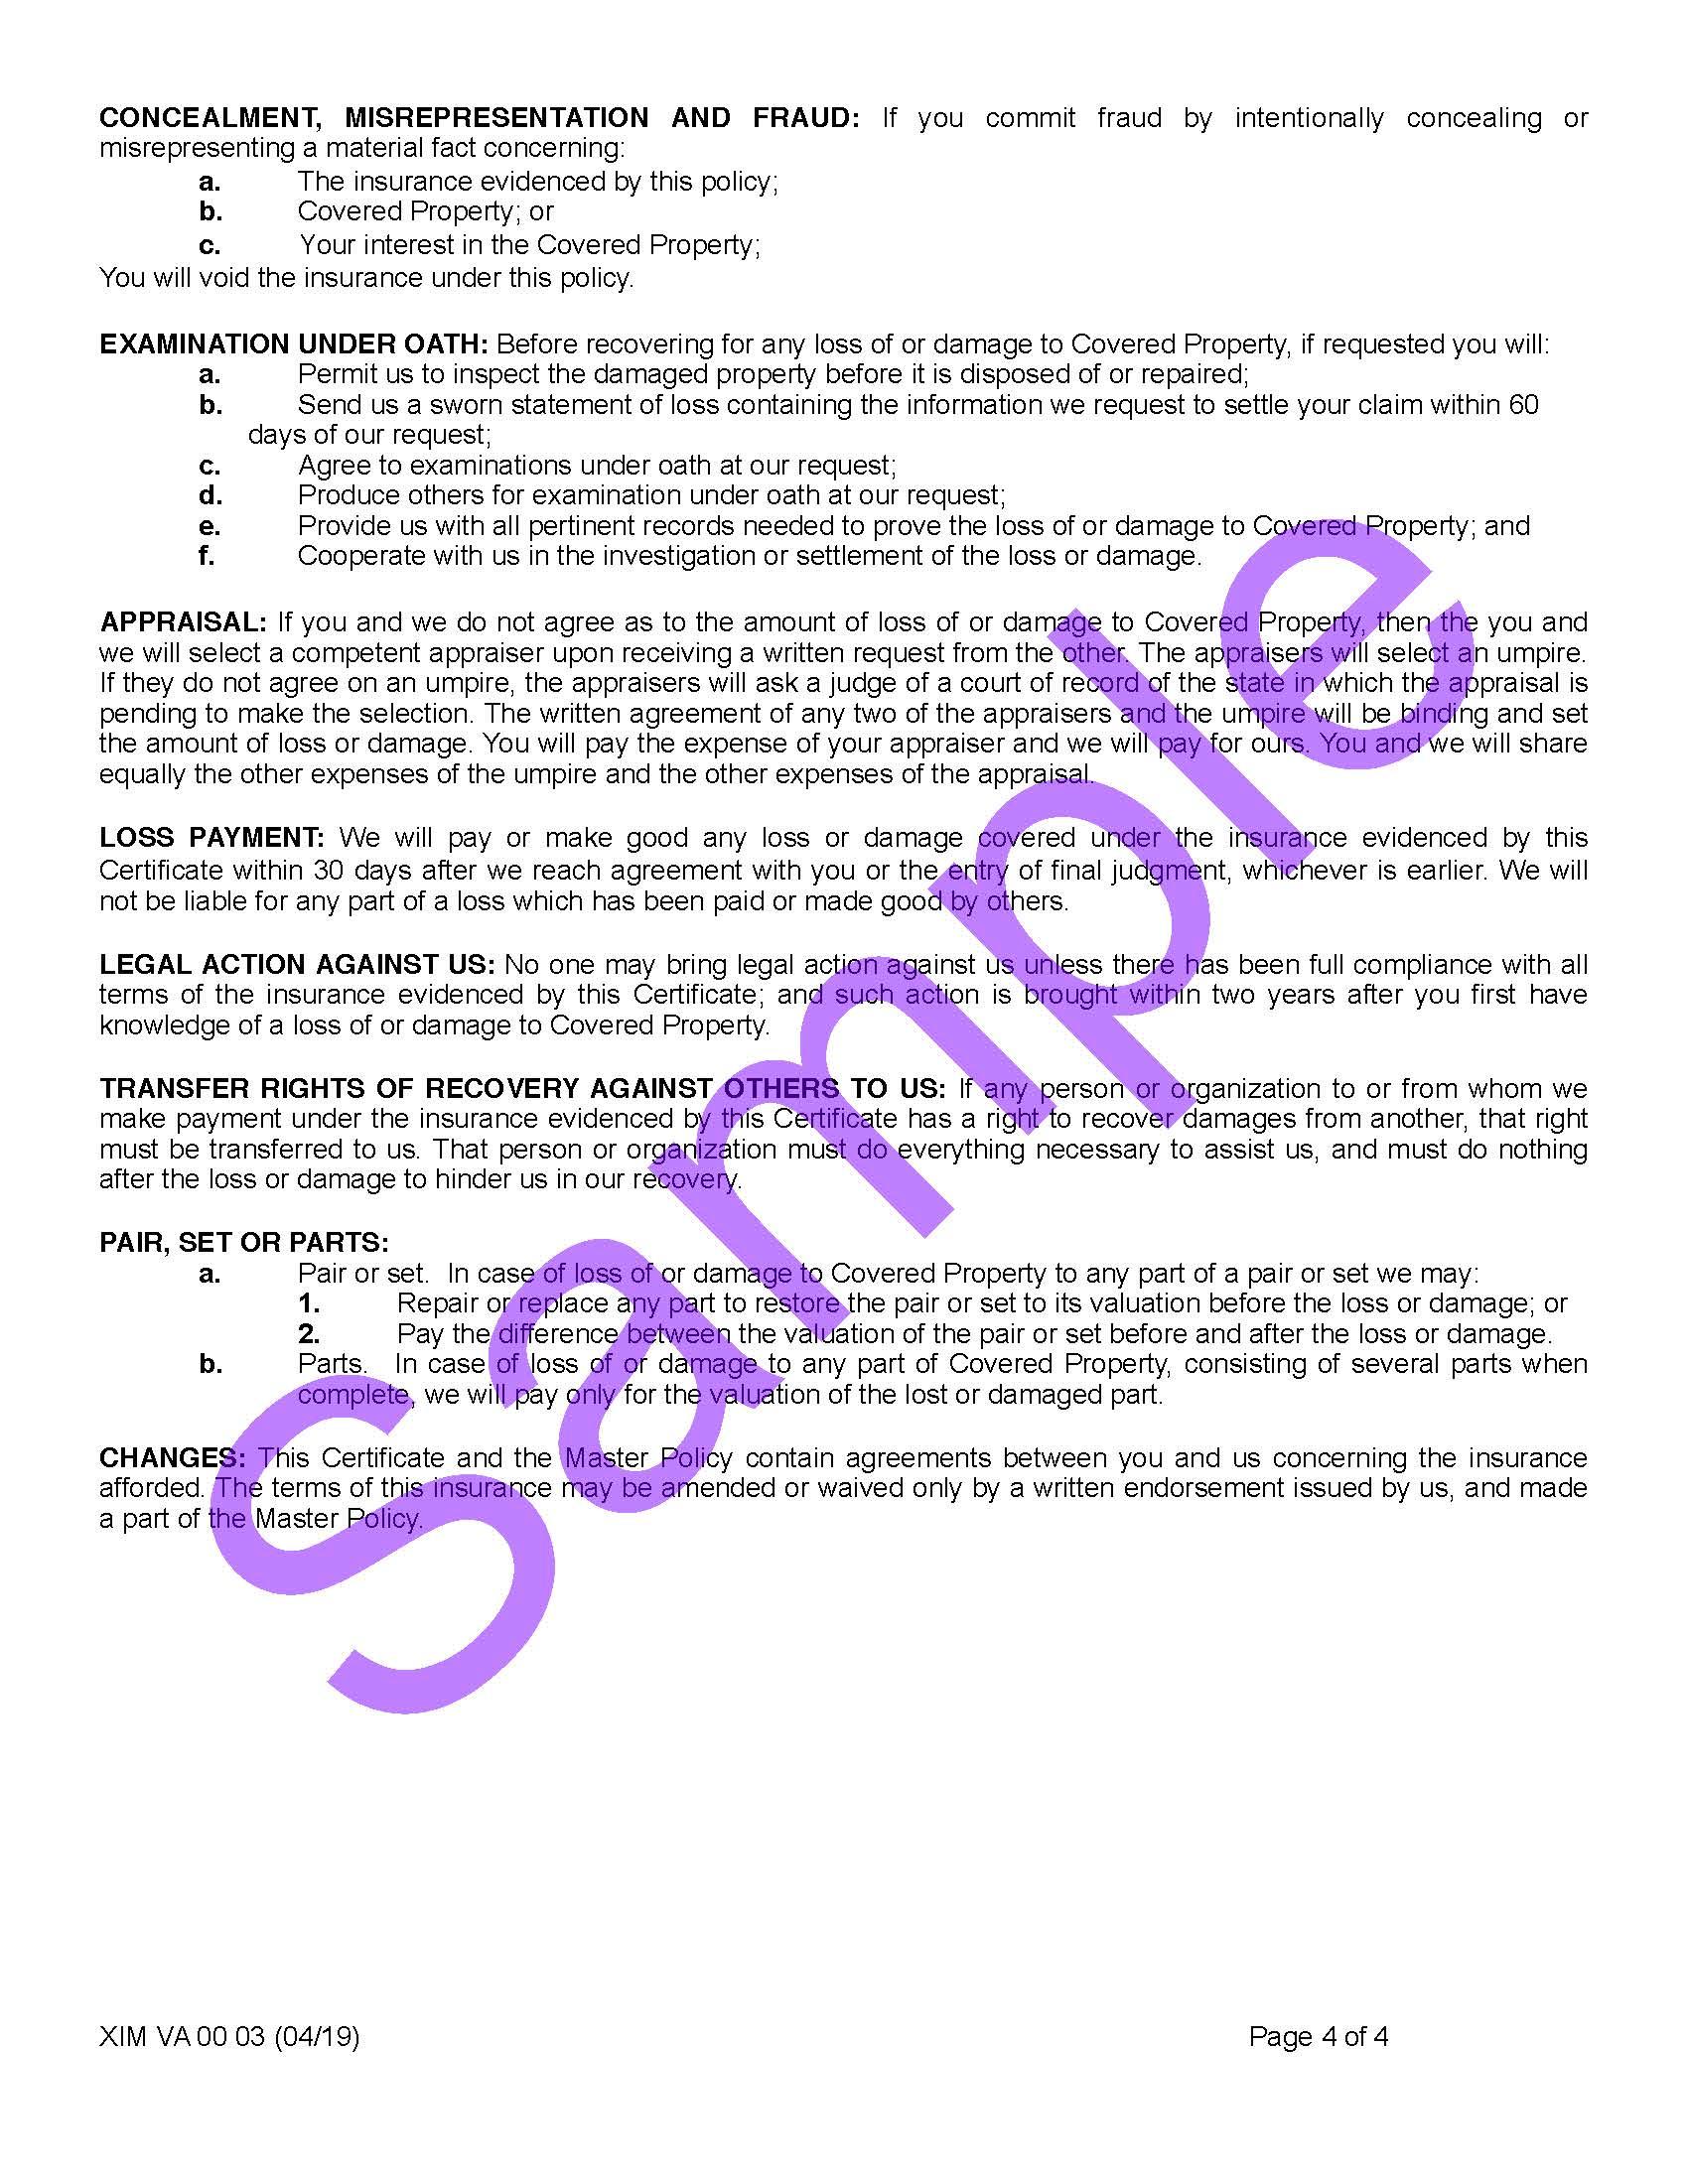 XIM VA 00 03 04 19 Virginia Certificate of InsuranceSample_Page_4.jpg